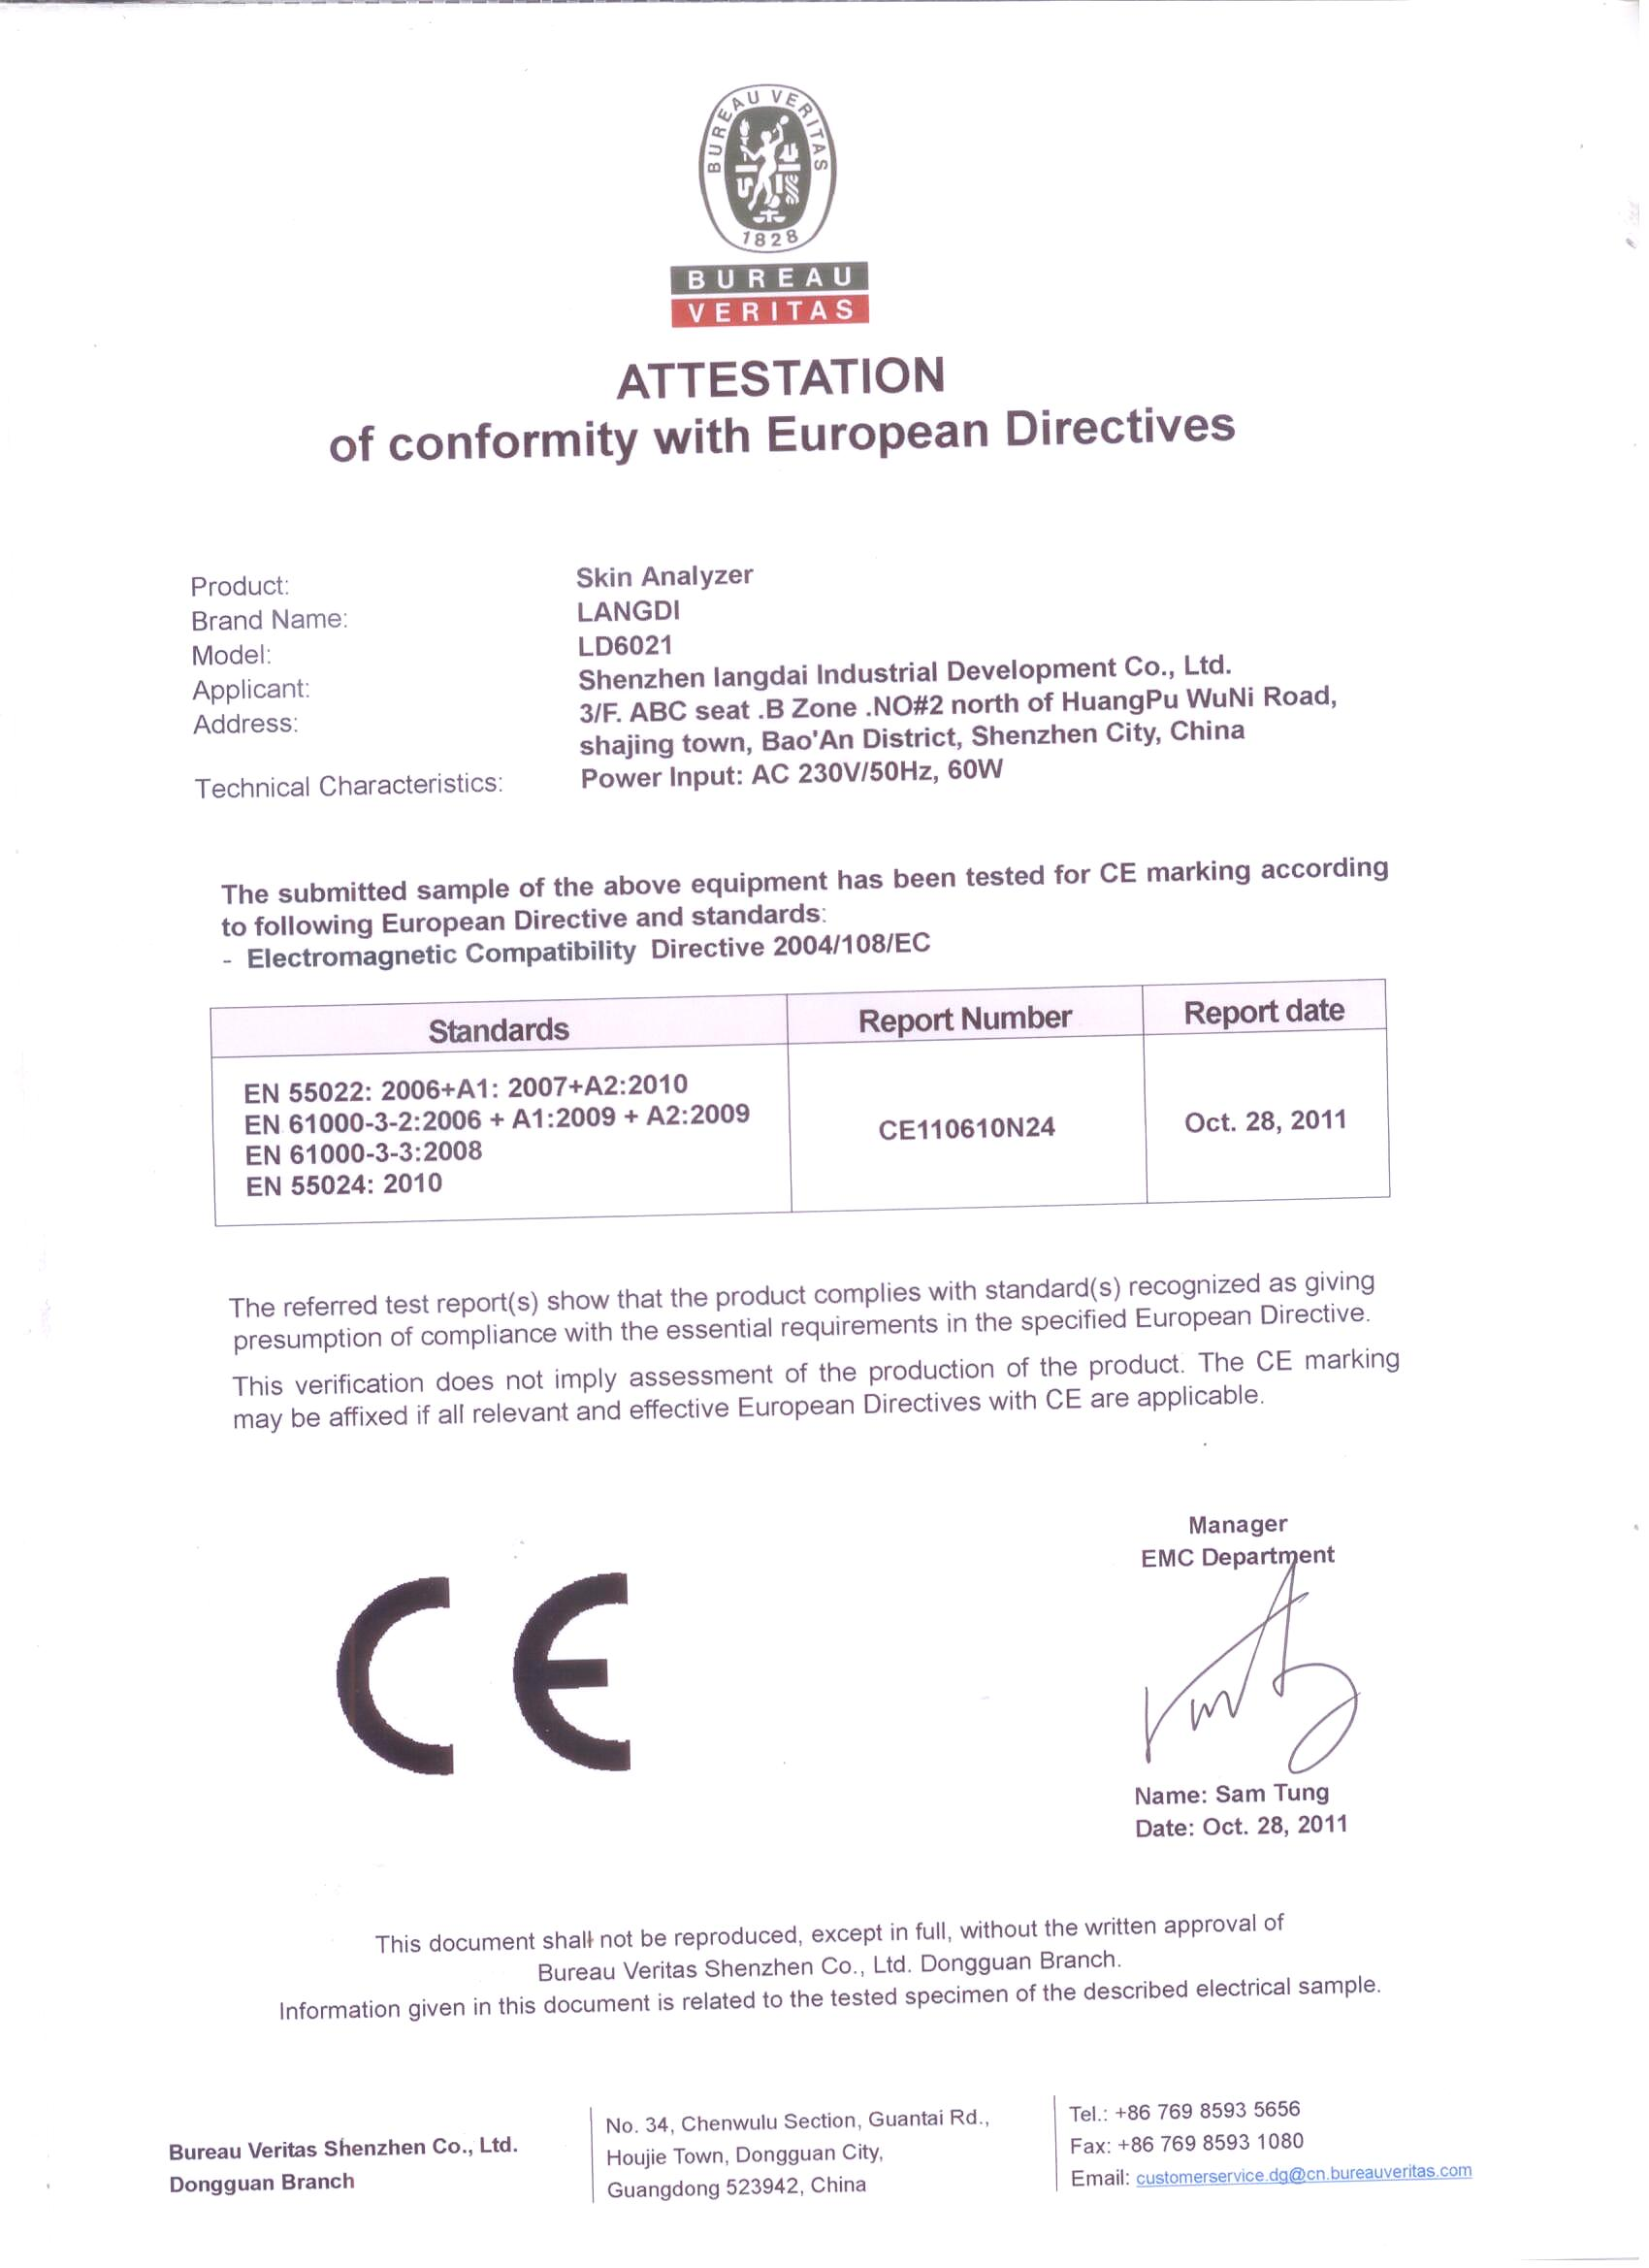 CE Certificate - LD6021 Skin Analyzer